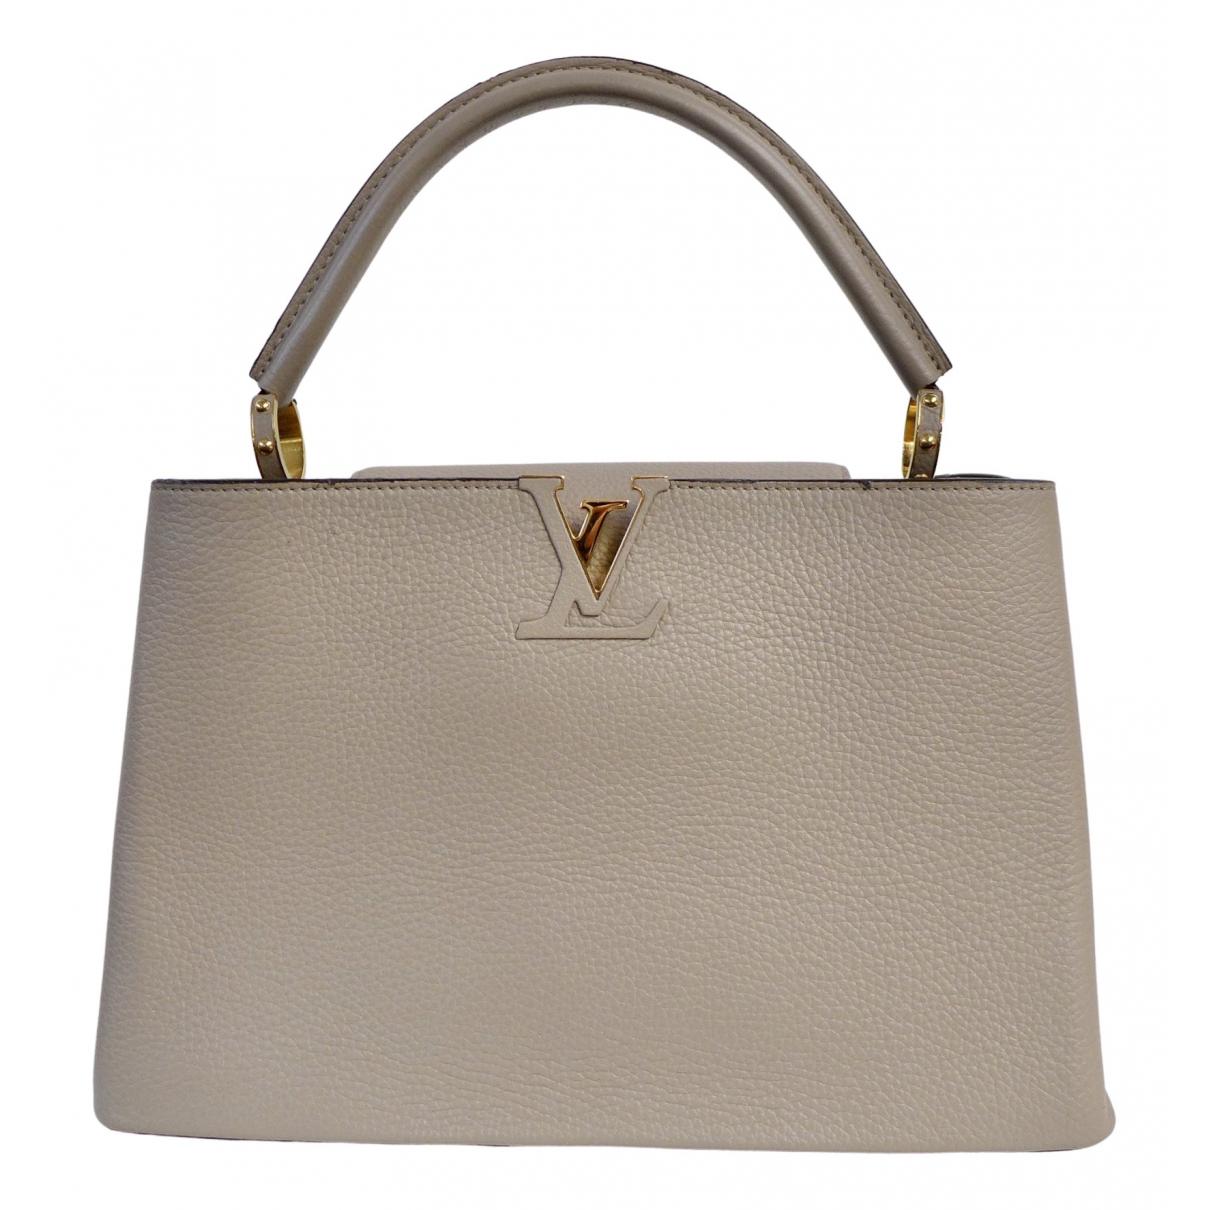 Louis Vuitton Capucines Leather handbag for Women \N